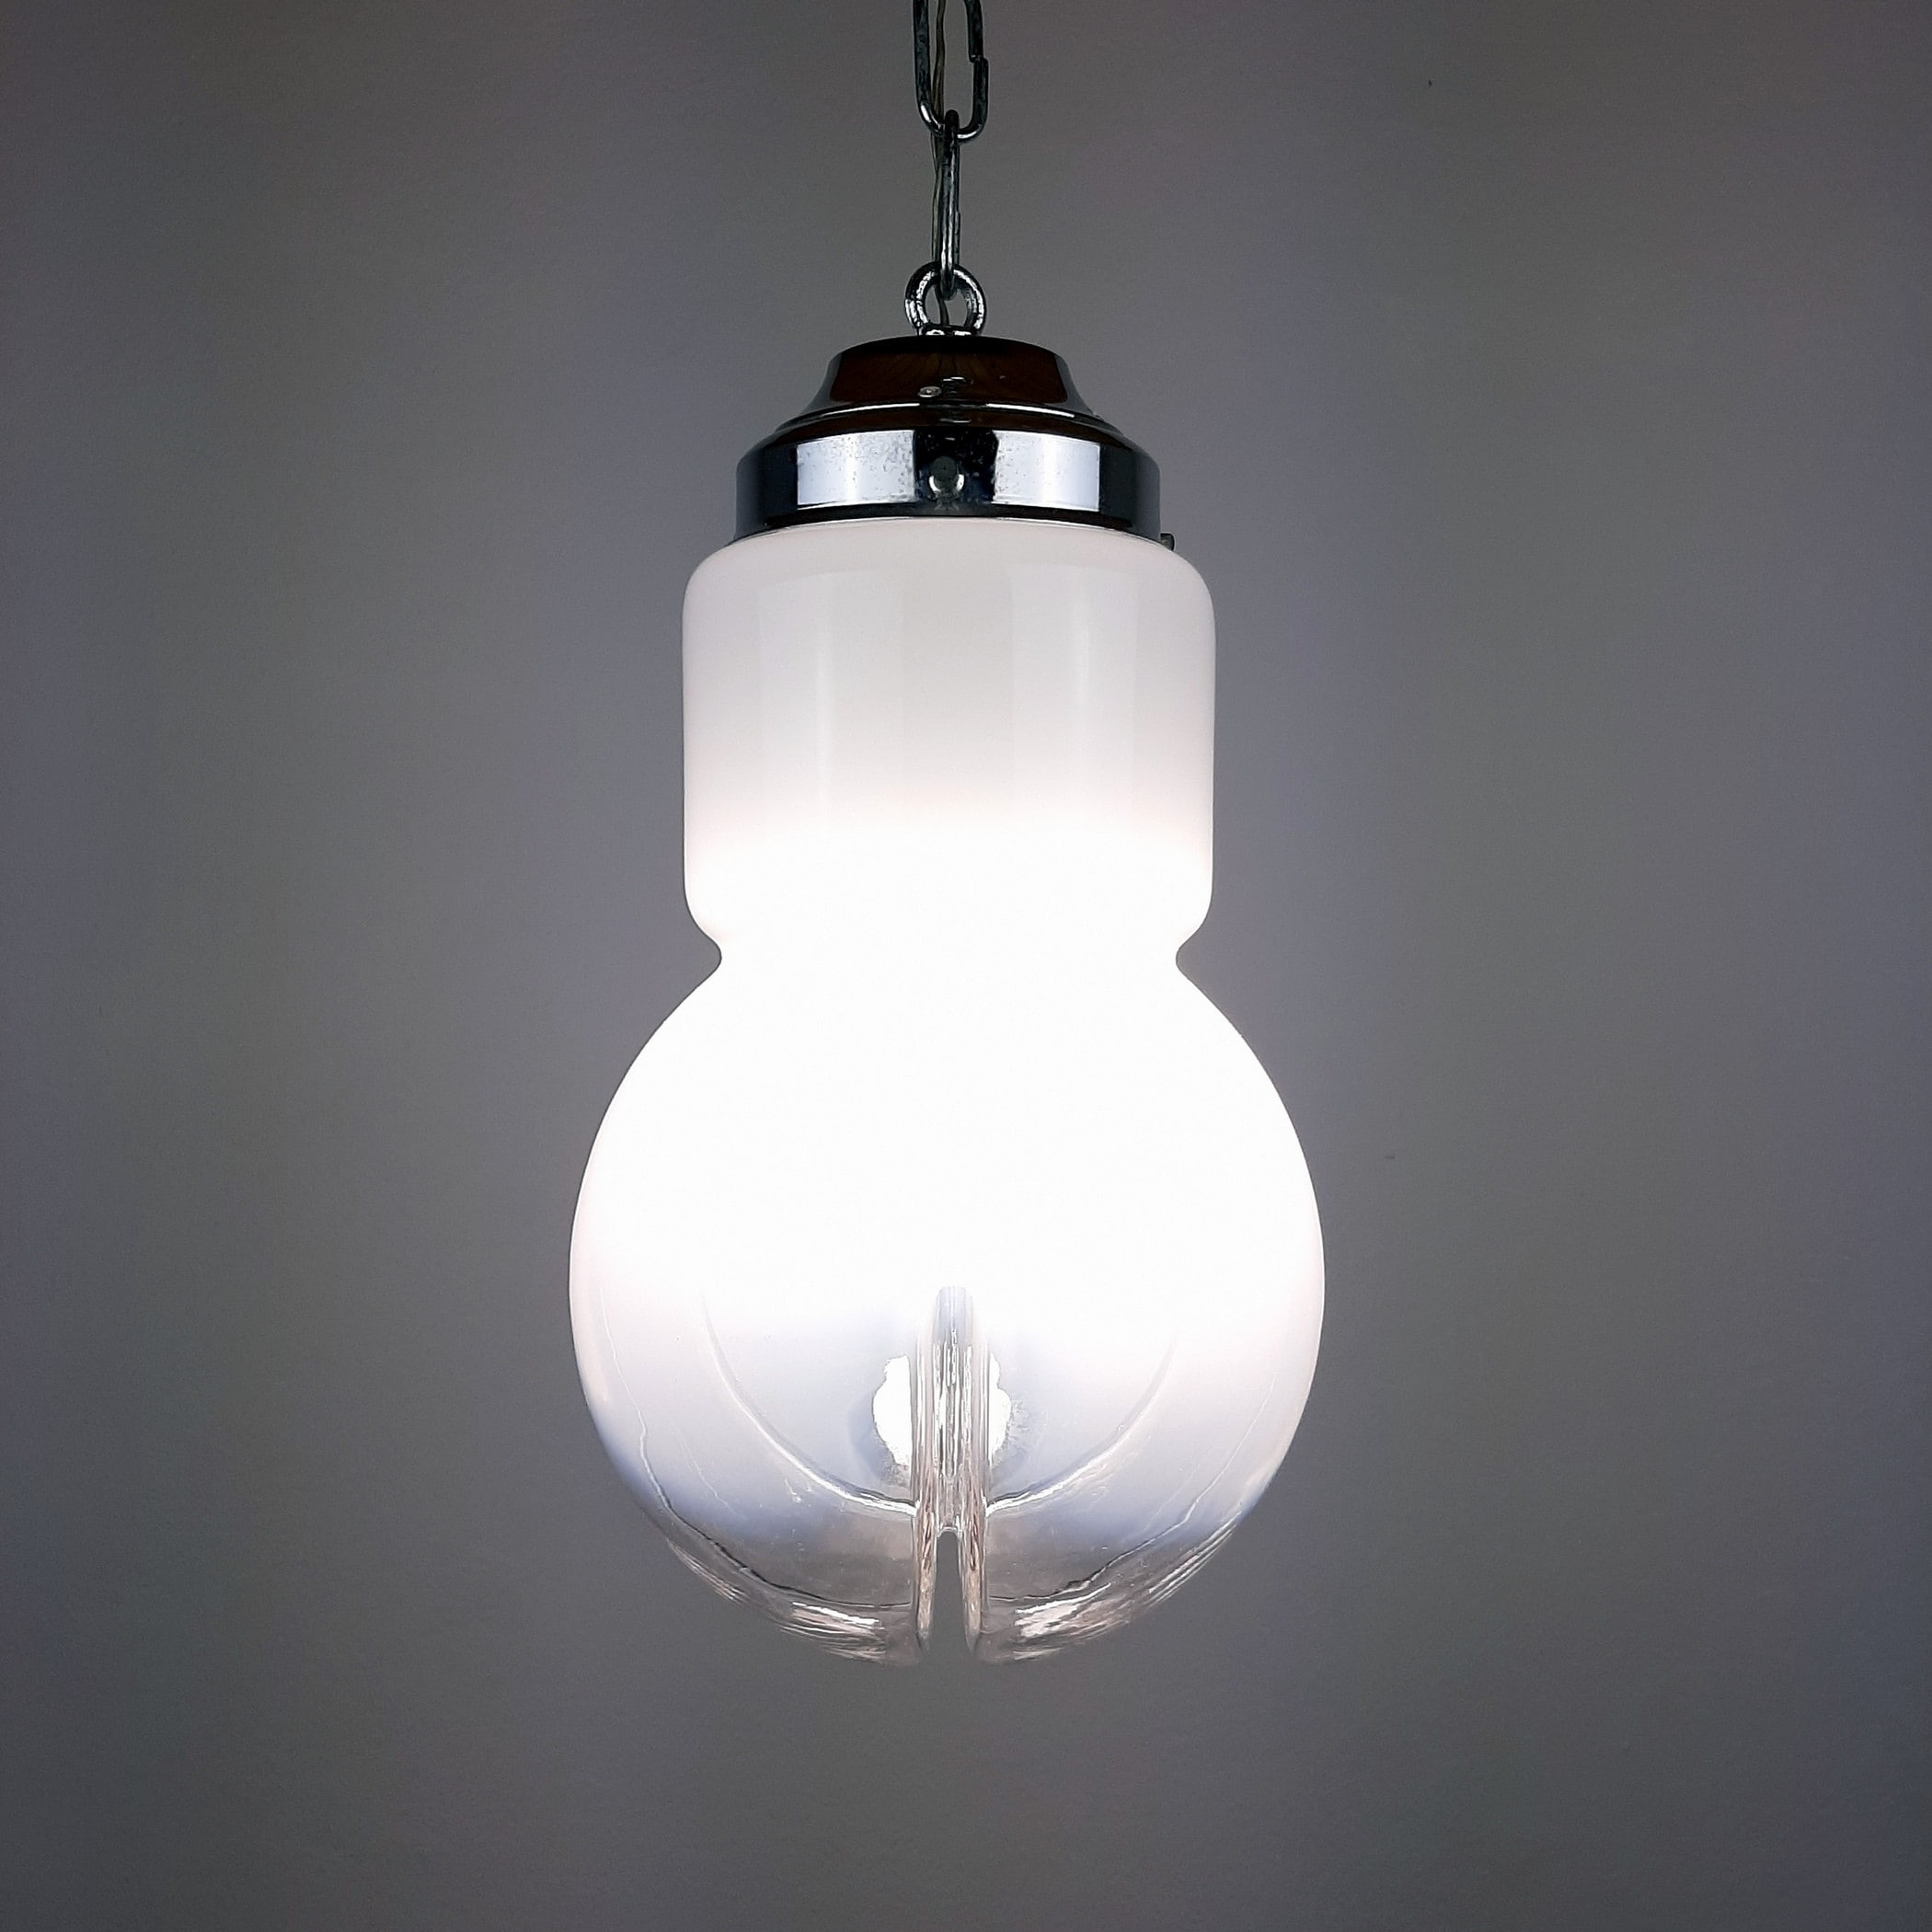 Mid-century murano glass pendant lamp Mazzega Italy 1970s Retro lighting Retro home decor Space age